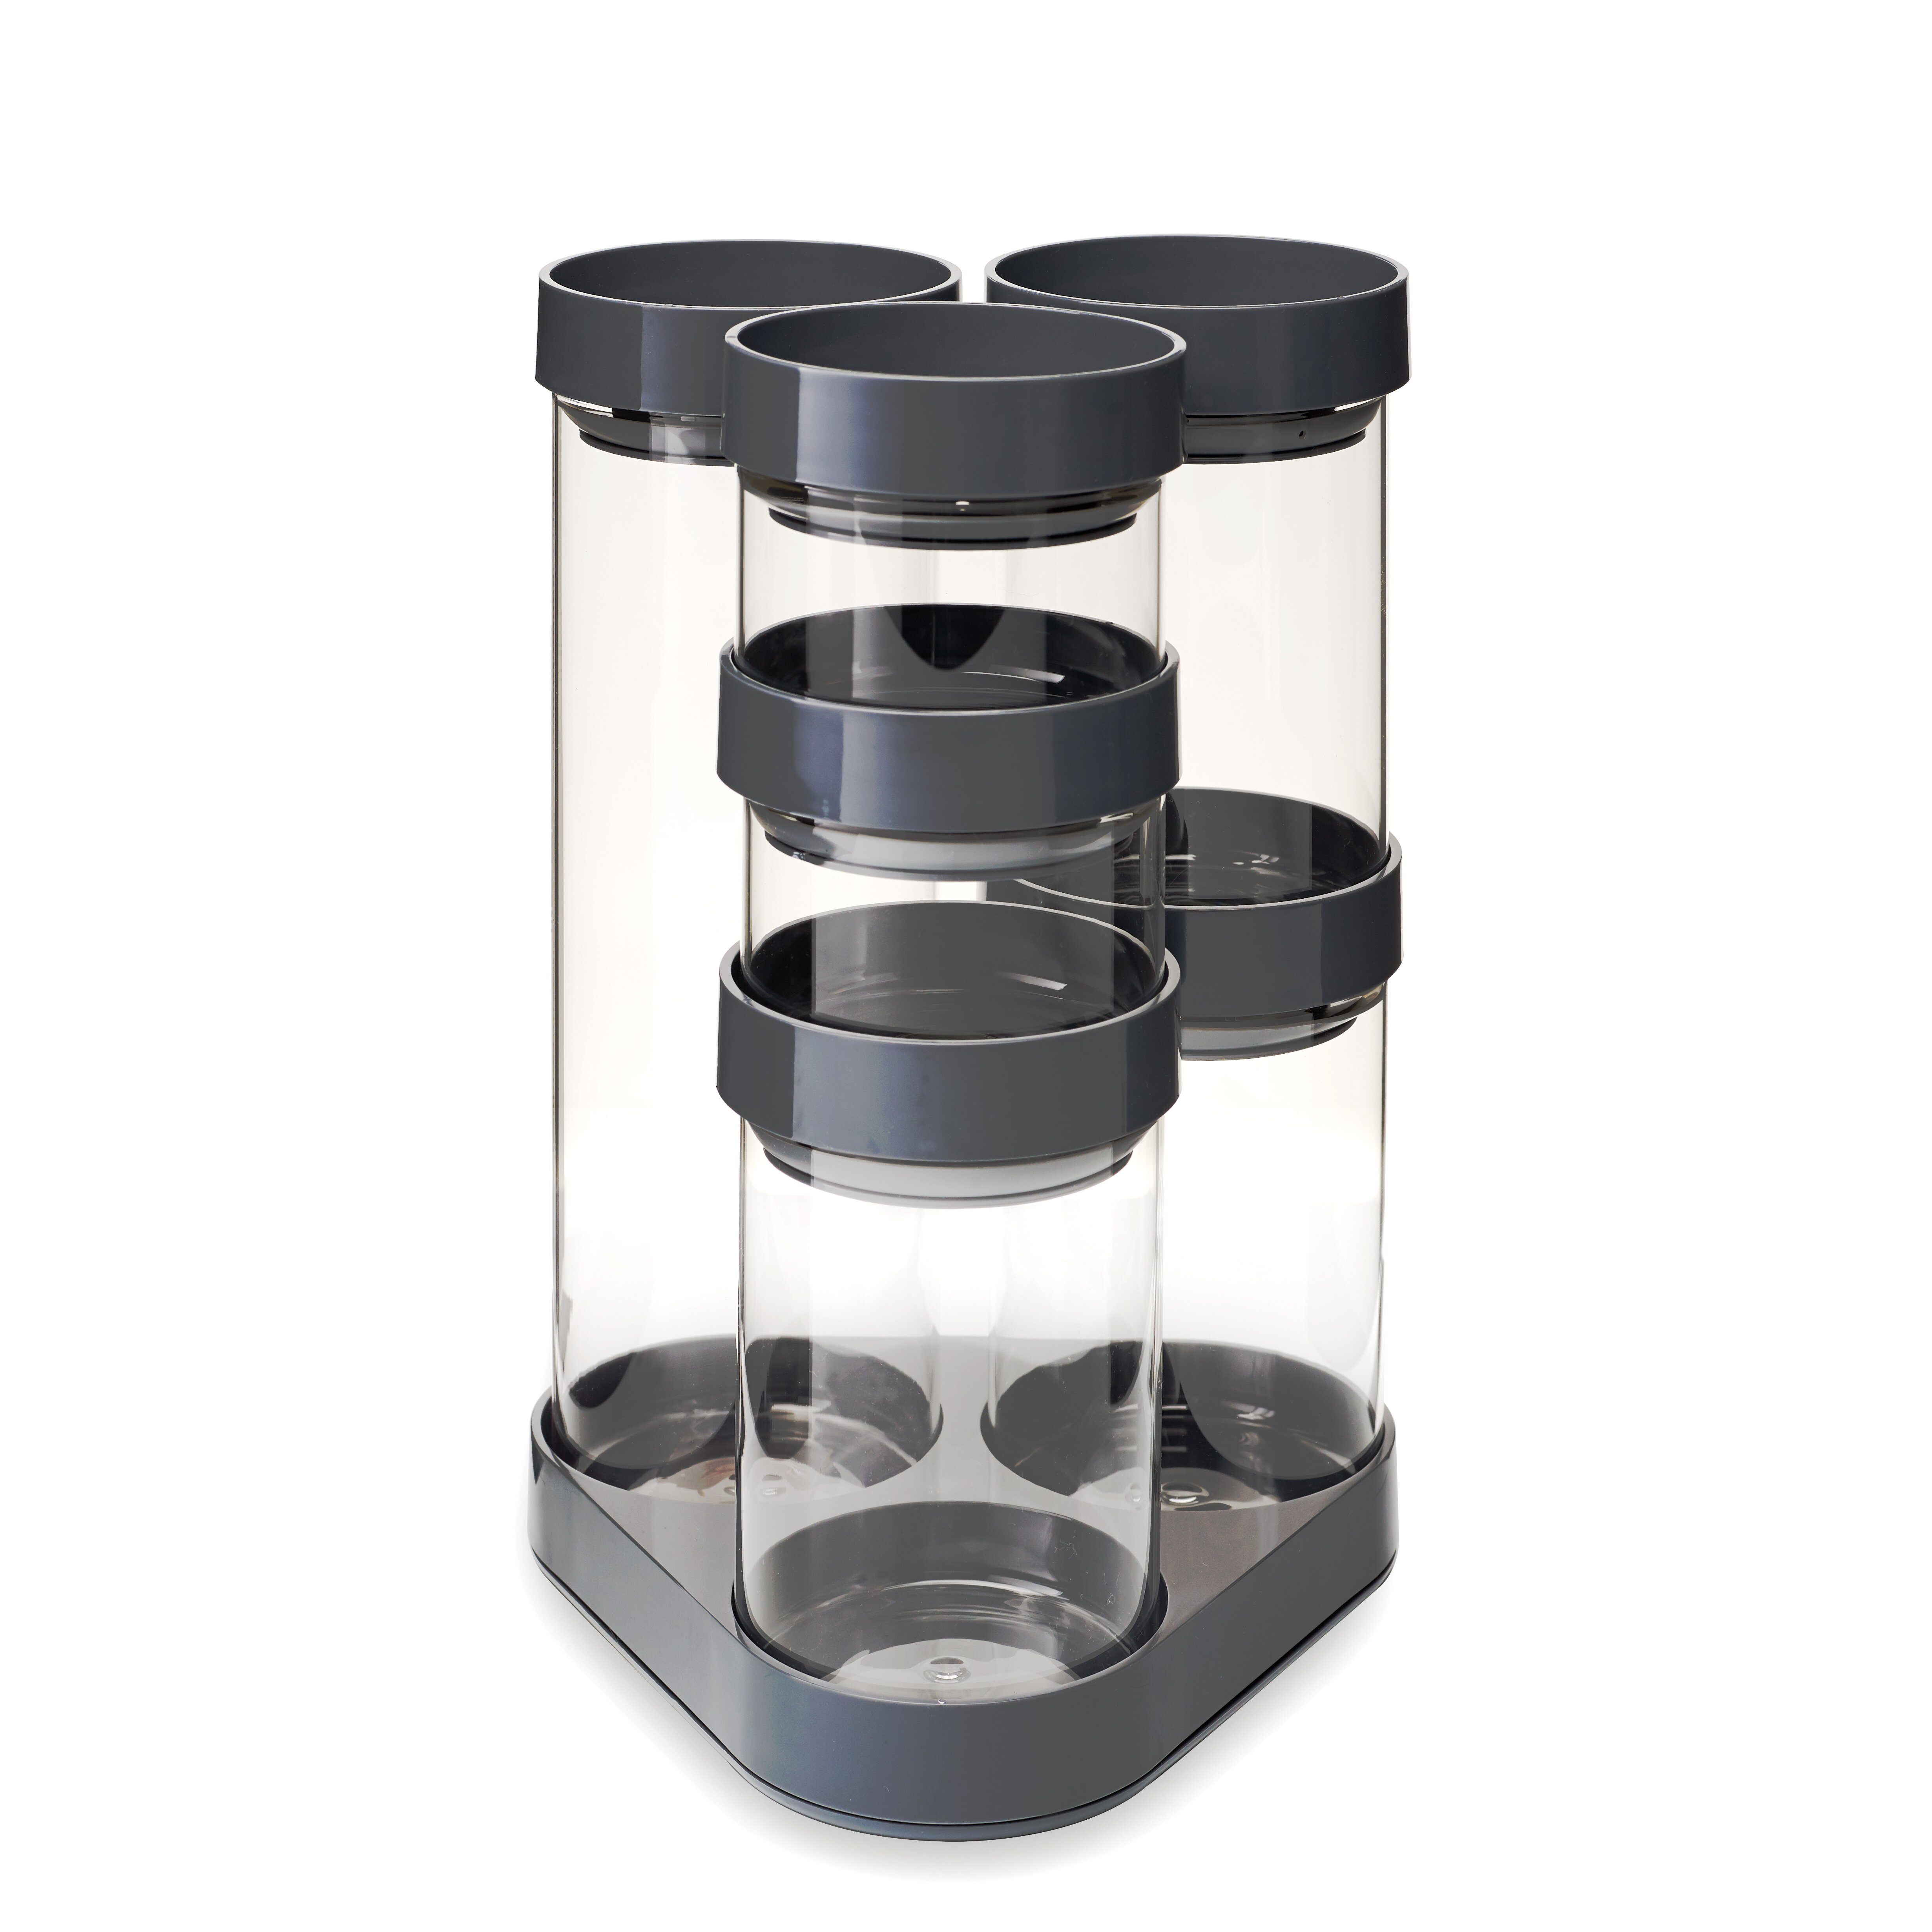 black kitchen canister sets ktvk us joseph joseph 6 piece kitchen canister set reviews wayfair